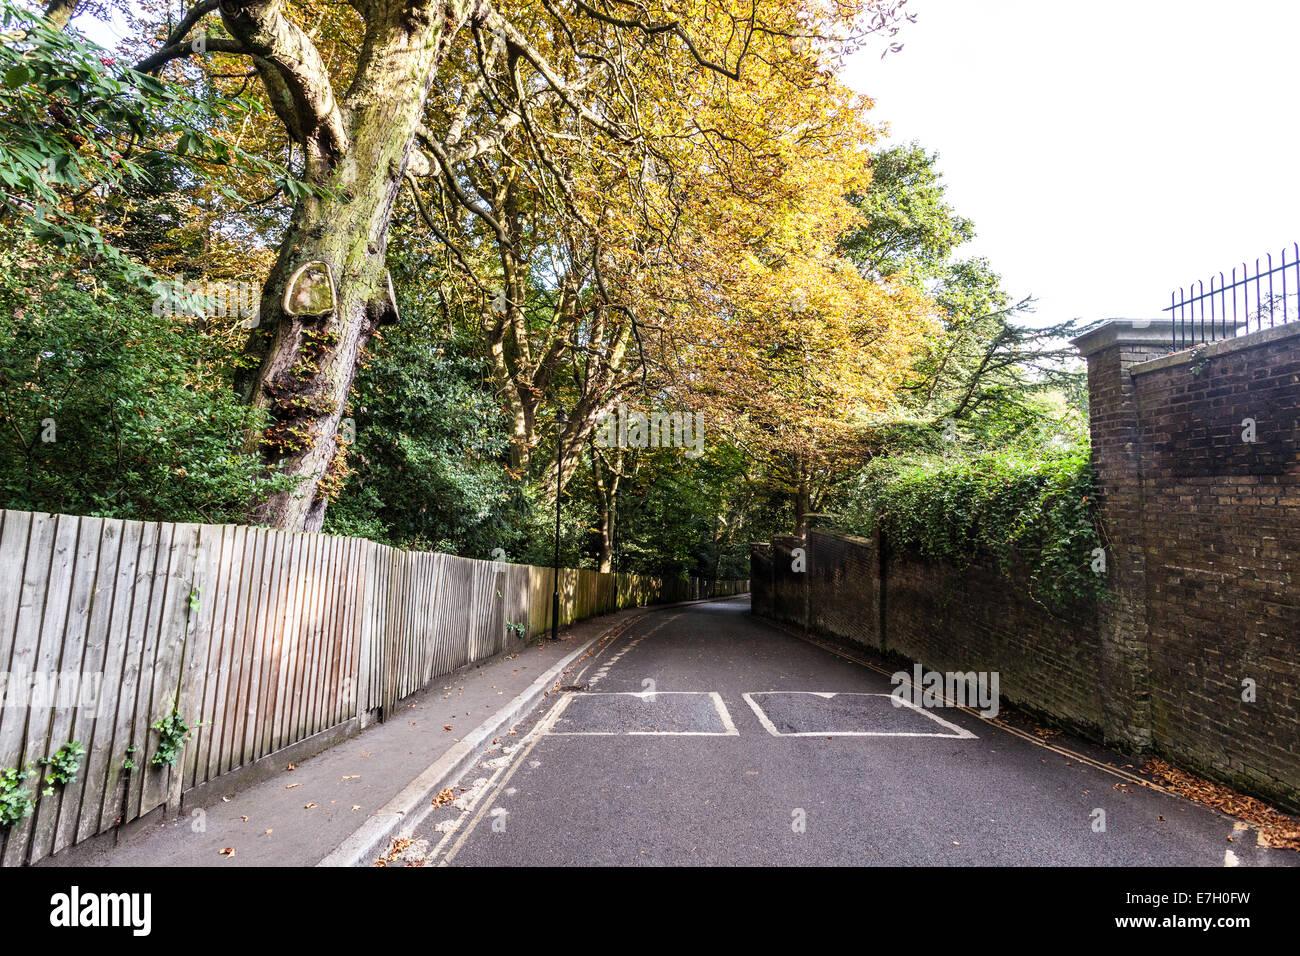 Swain's Lane, Highgate, London, UK - Stock Image